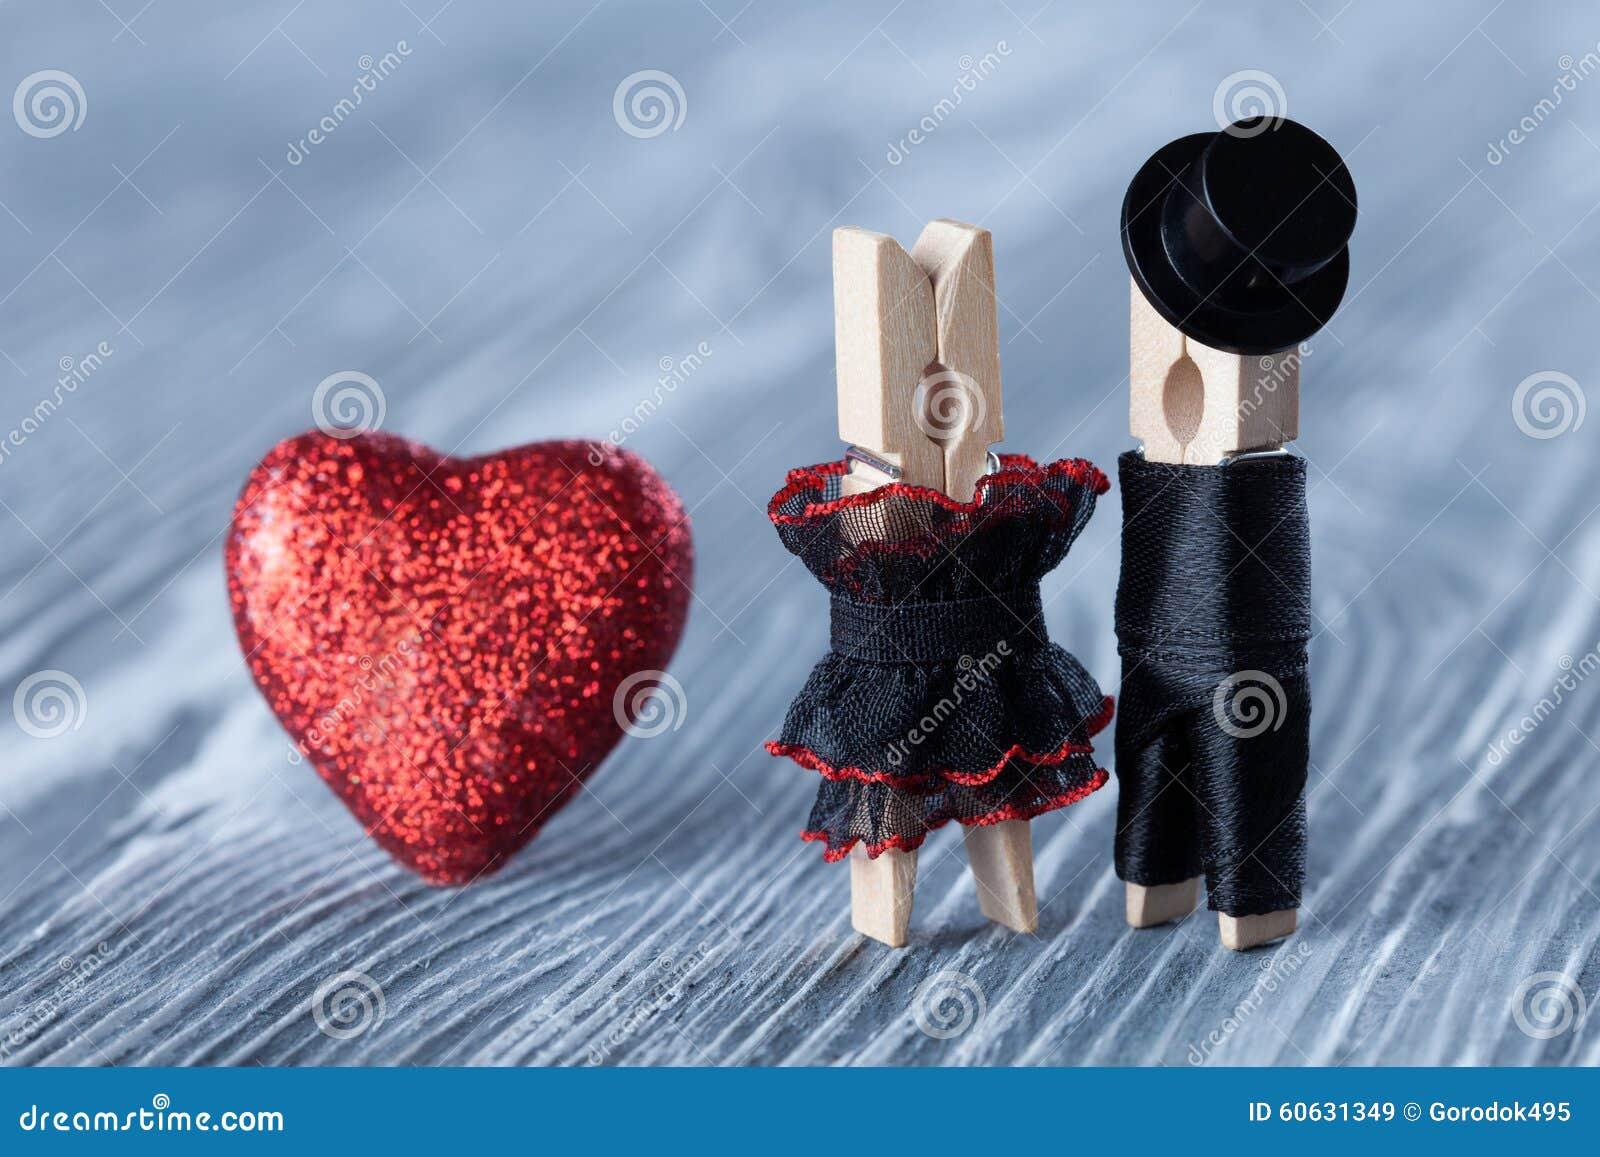 Romantic Couple. Wedding Invitation. Groom In Black Suit Hat And ...